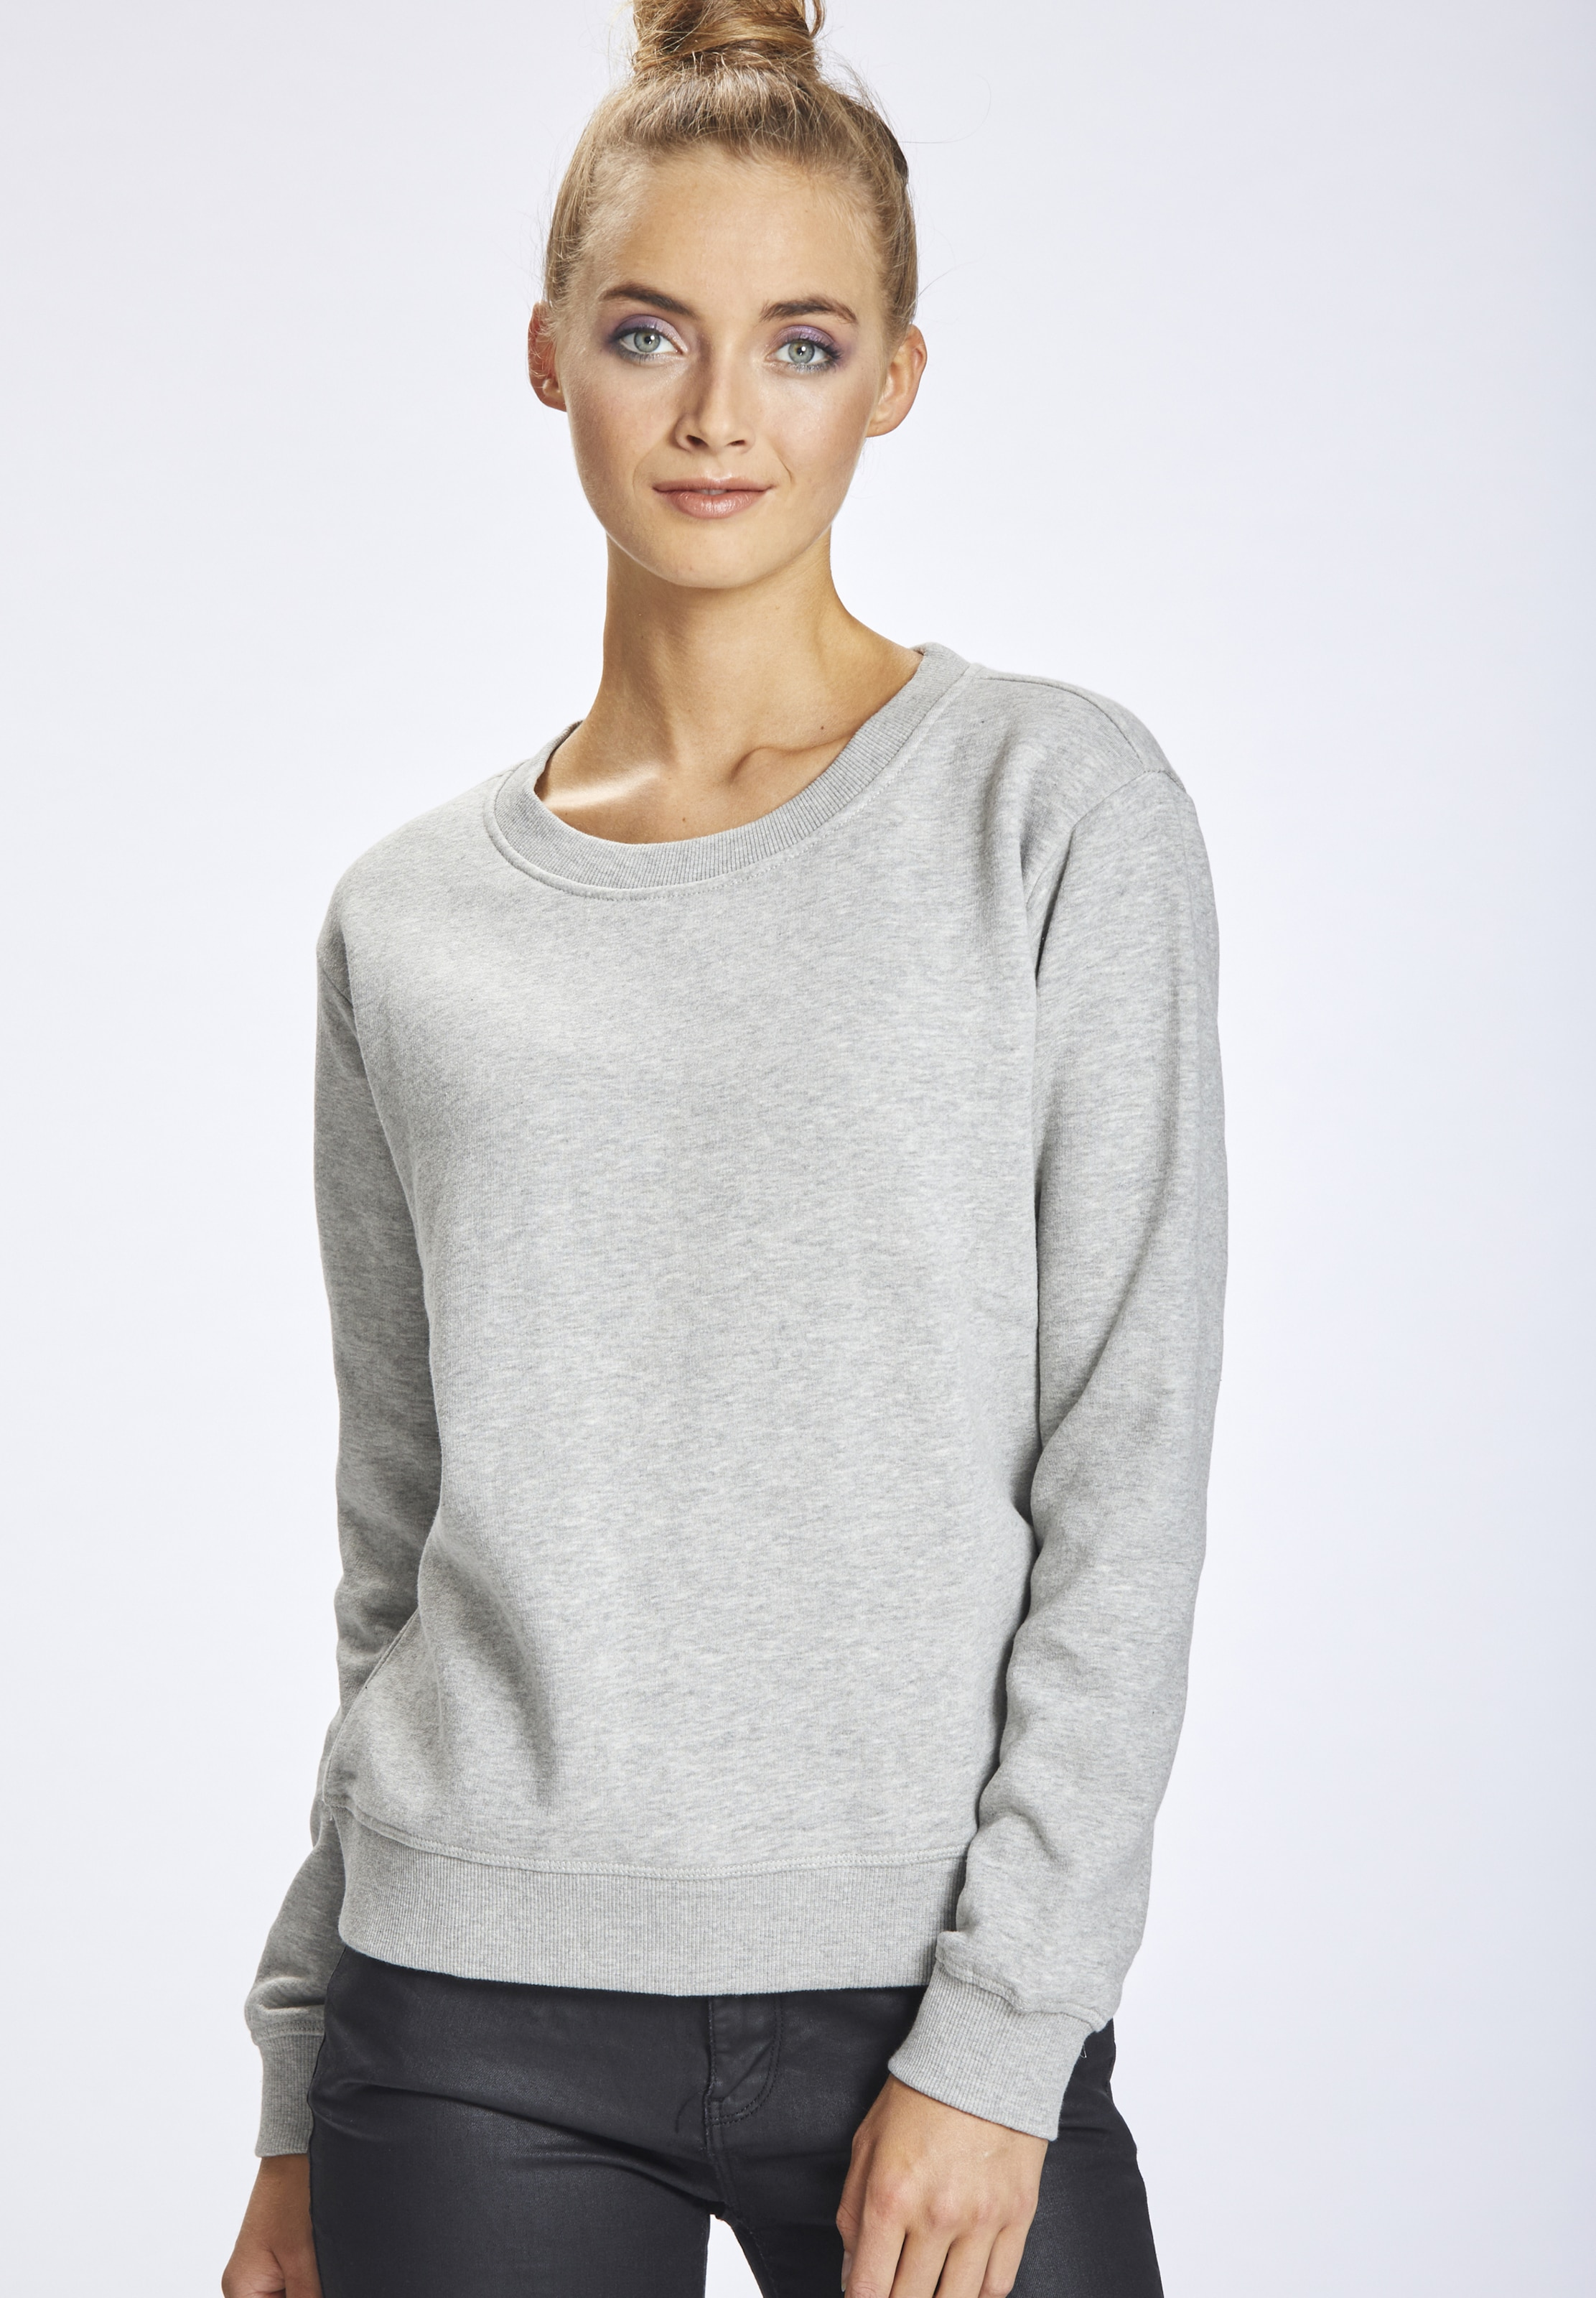 Mymo In Sweater Grau Sweater Mymo hxtsdCQr